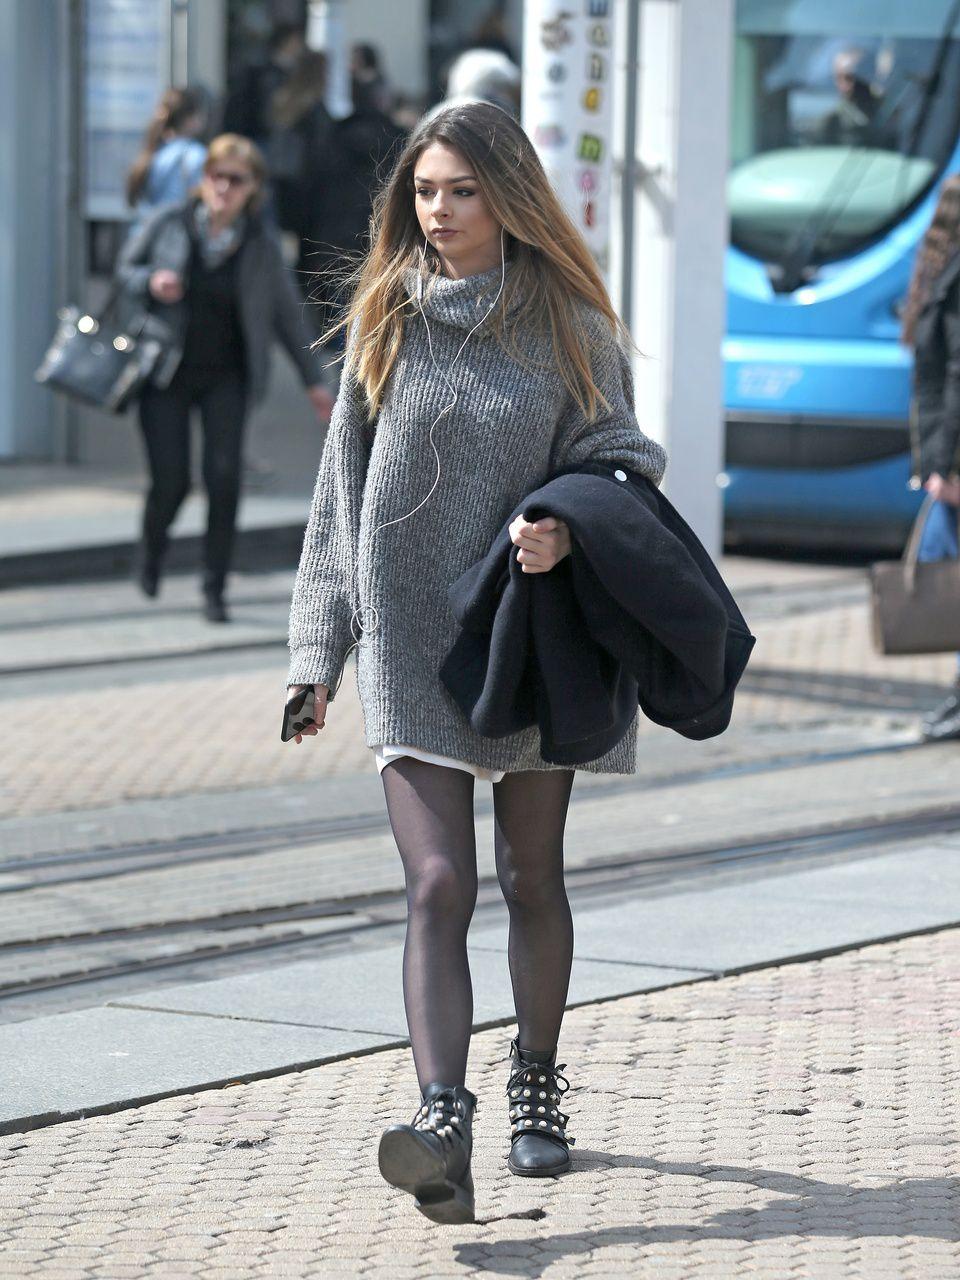 Djevojka iz centra Zagreba isfurala samo džemper u kojem izgleda fantastično!